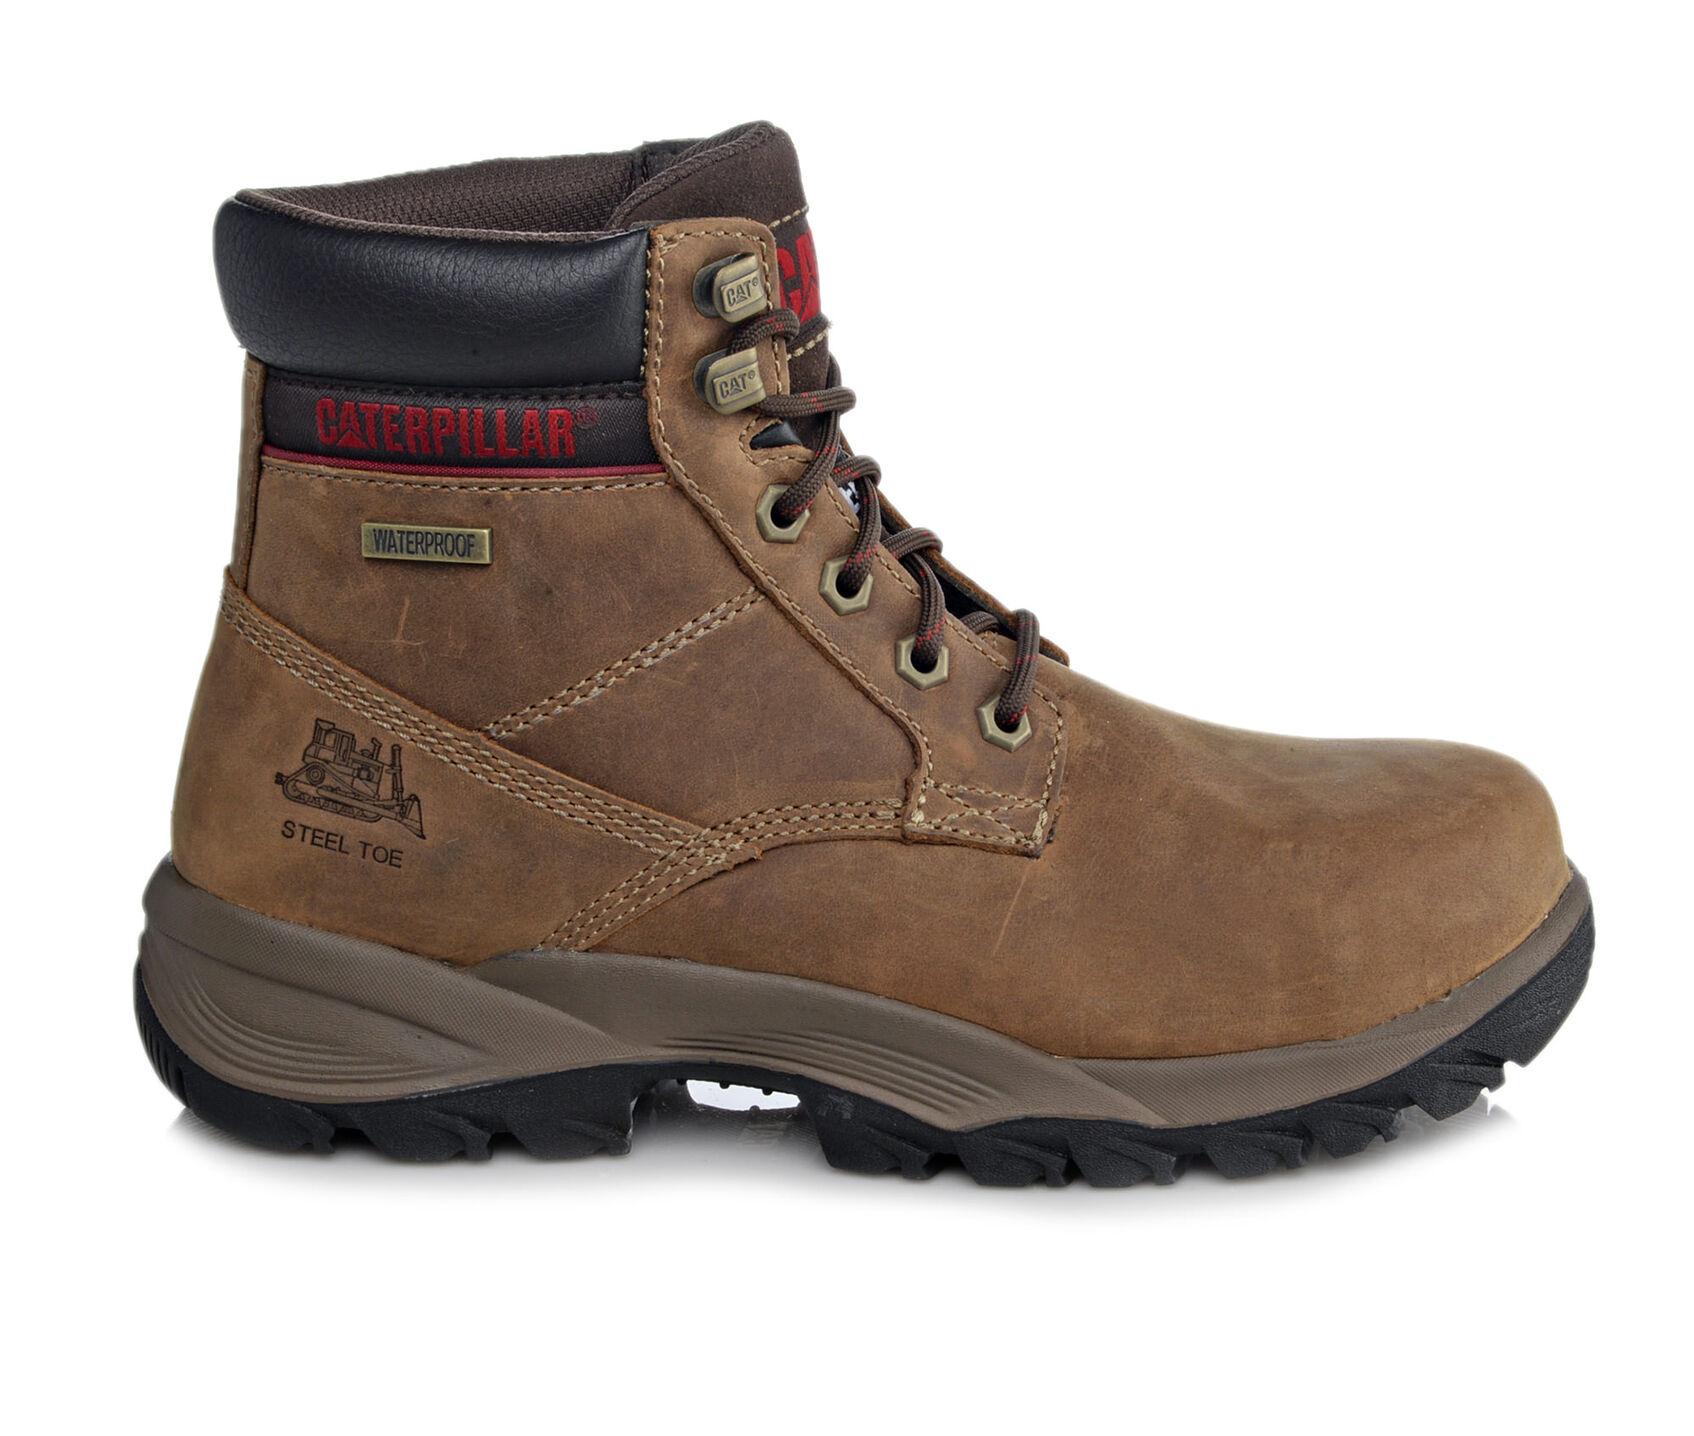 92491109cdc Women's Caterpillar Dryverse 6 In Waterproof Steel Toe Work Boots